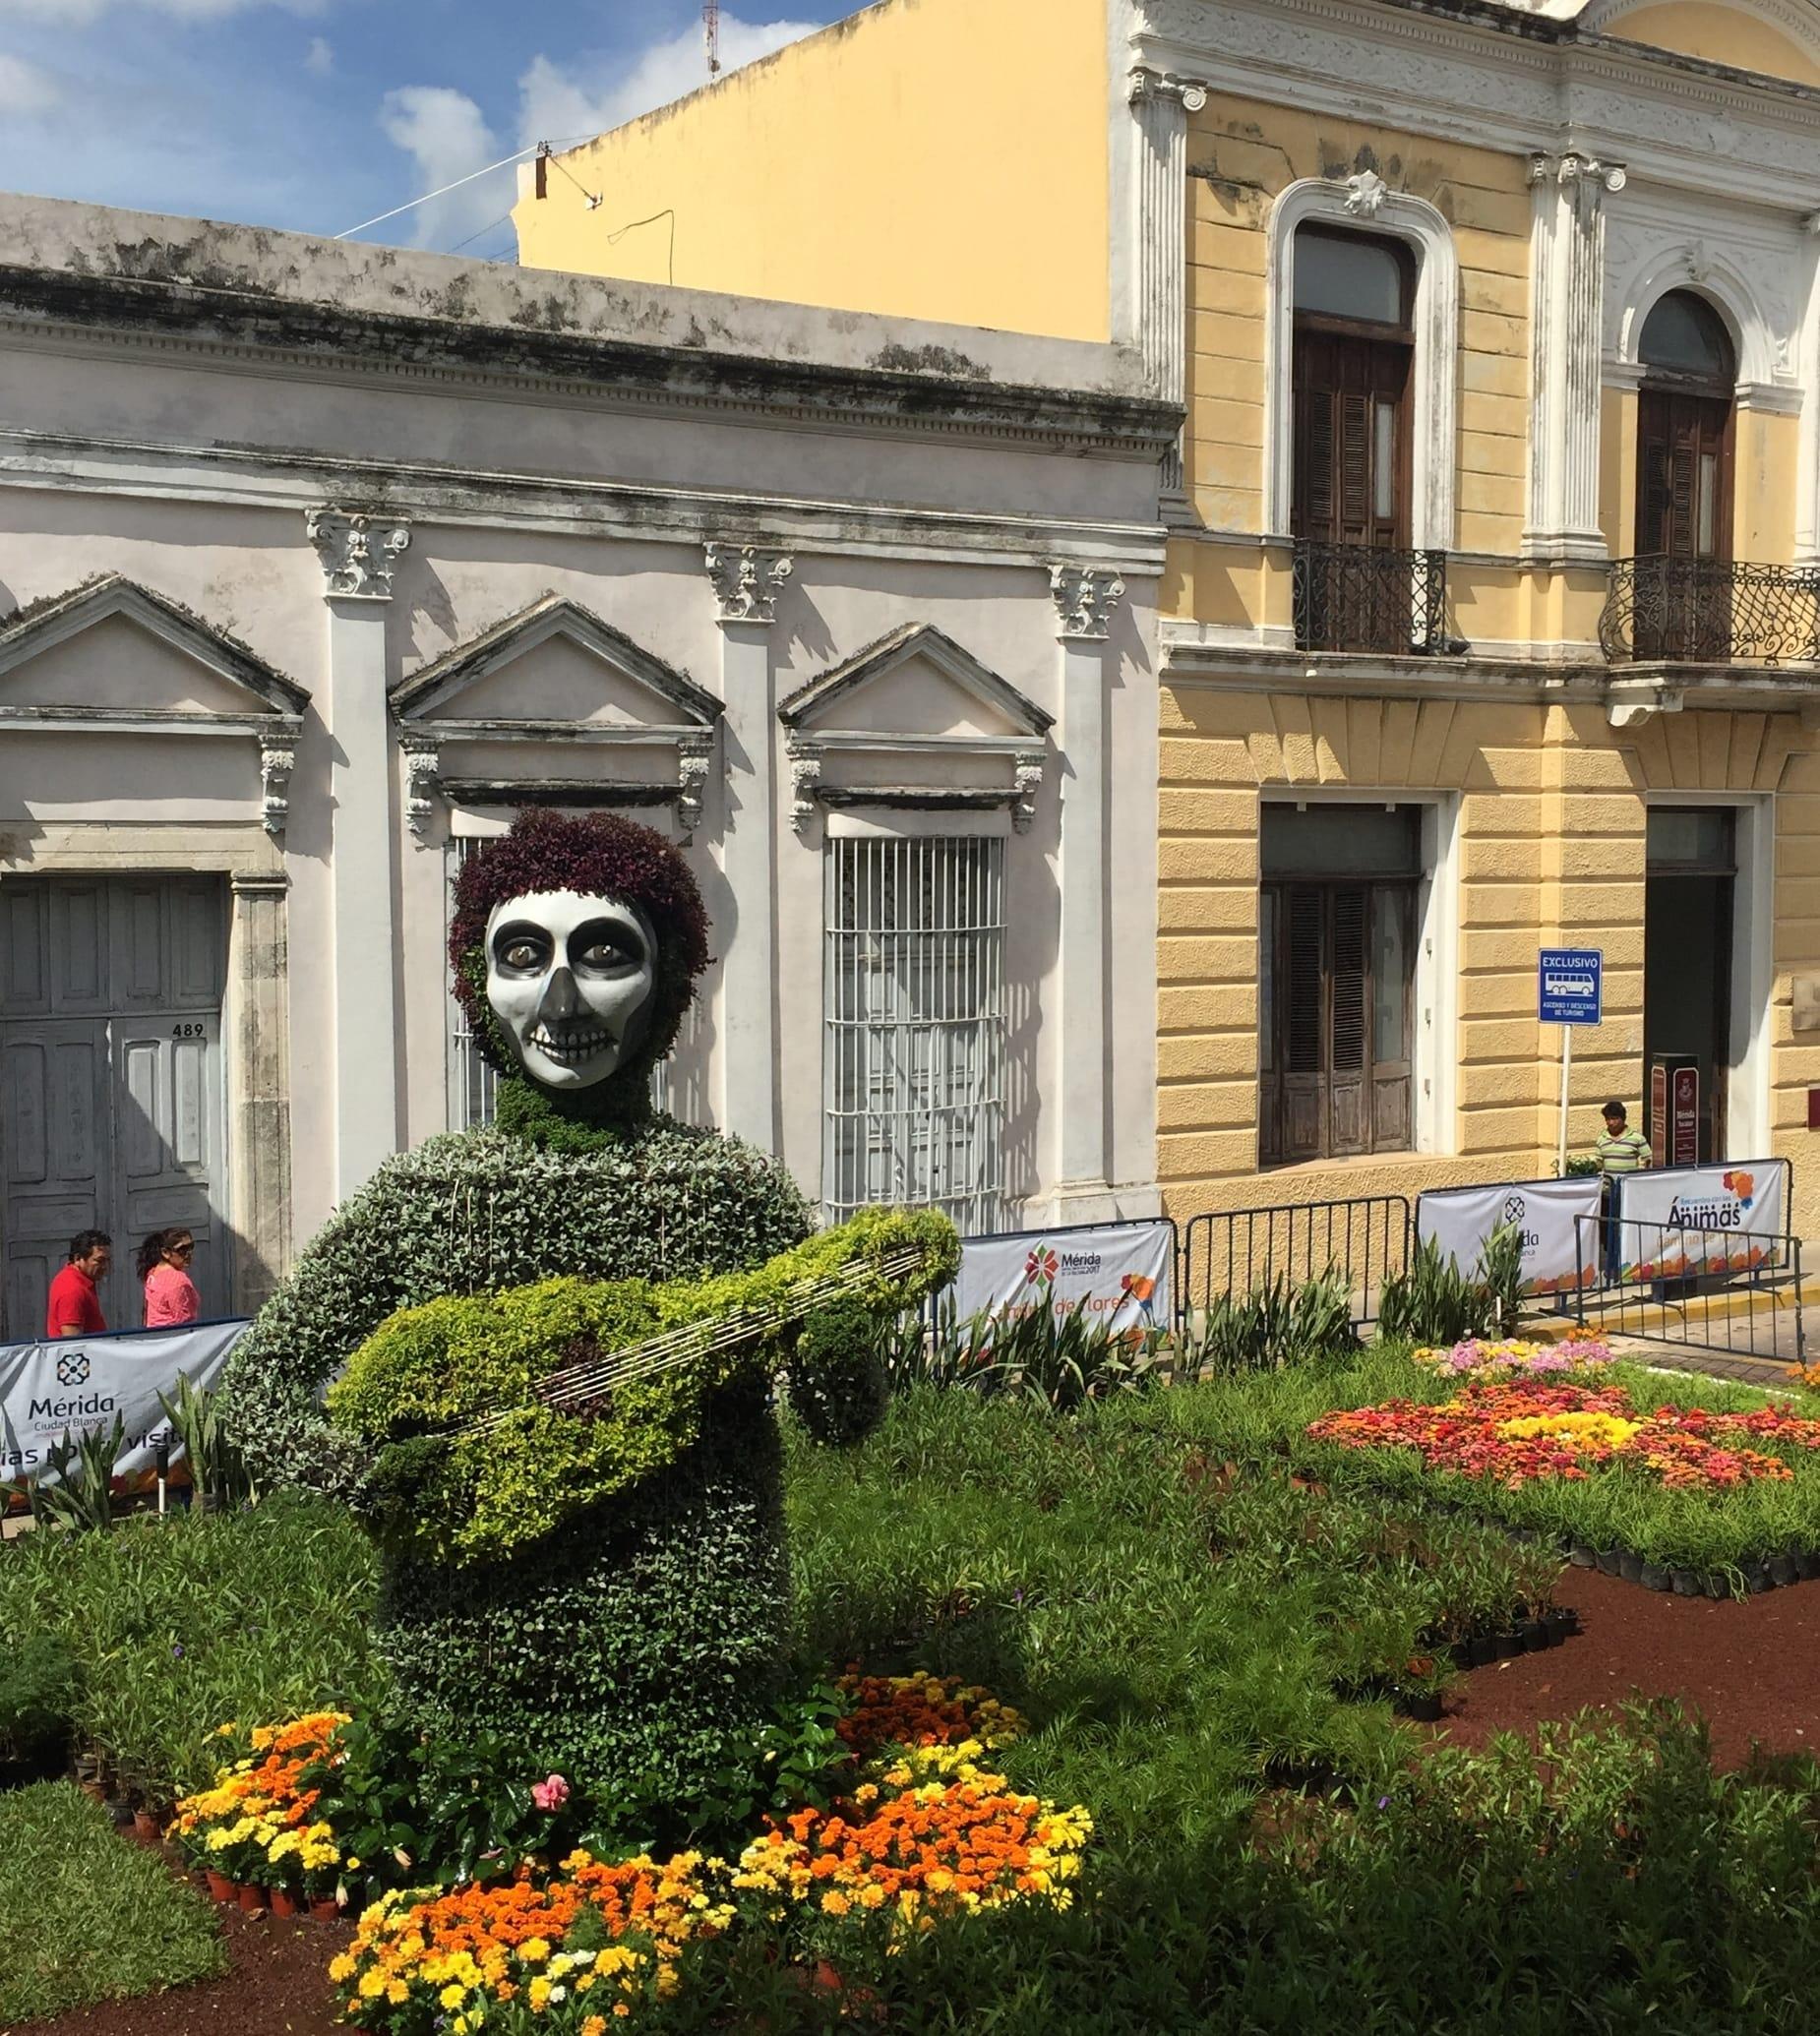 Visiting the Folk Art Museum Merida Mexico 4.jpg